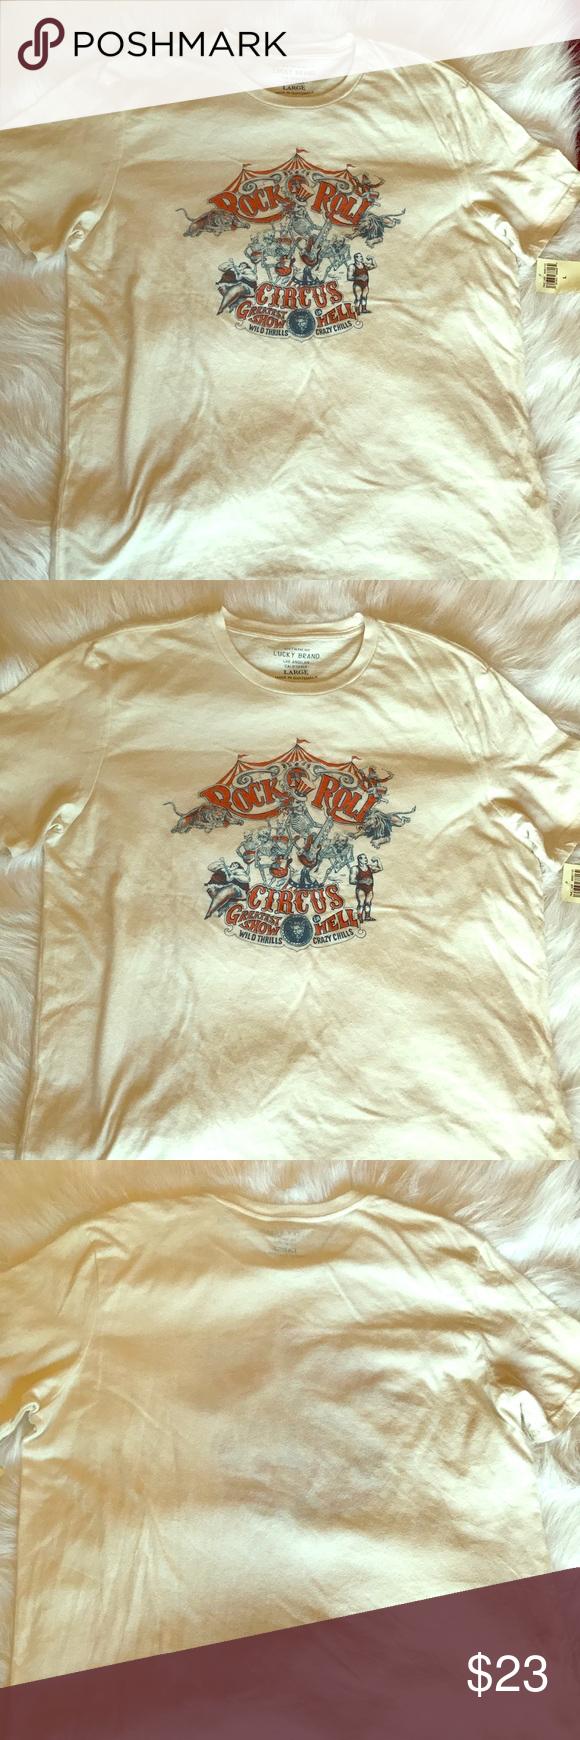 87dca011 Lucky 🍀 brand Rock n Roll Circus Men's T-shirt White Lucky 🍀Brand T-shirt  Lucky Brand Shirts Tees - Short Sleeve